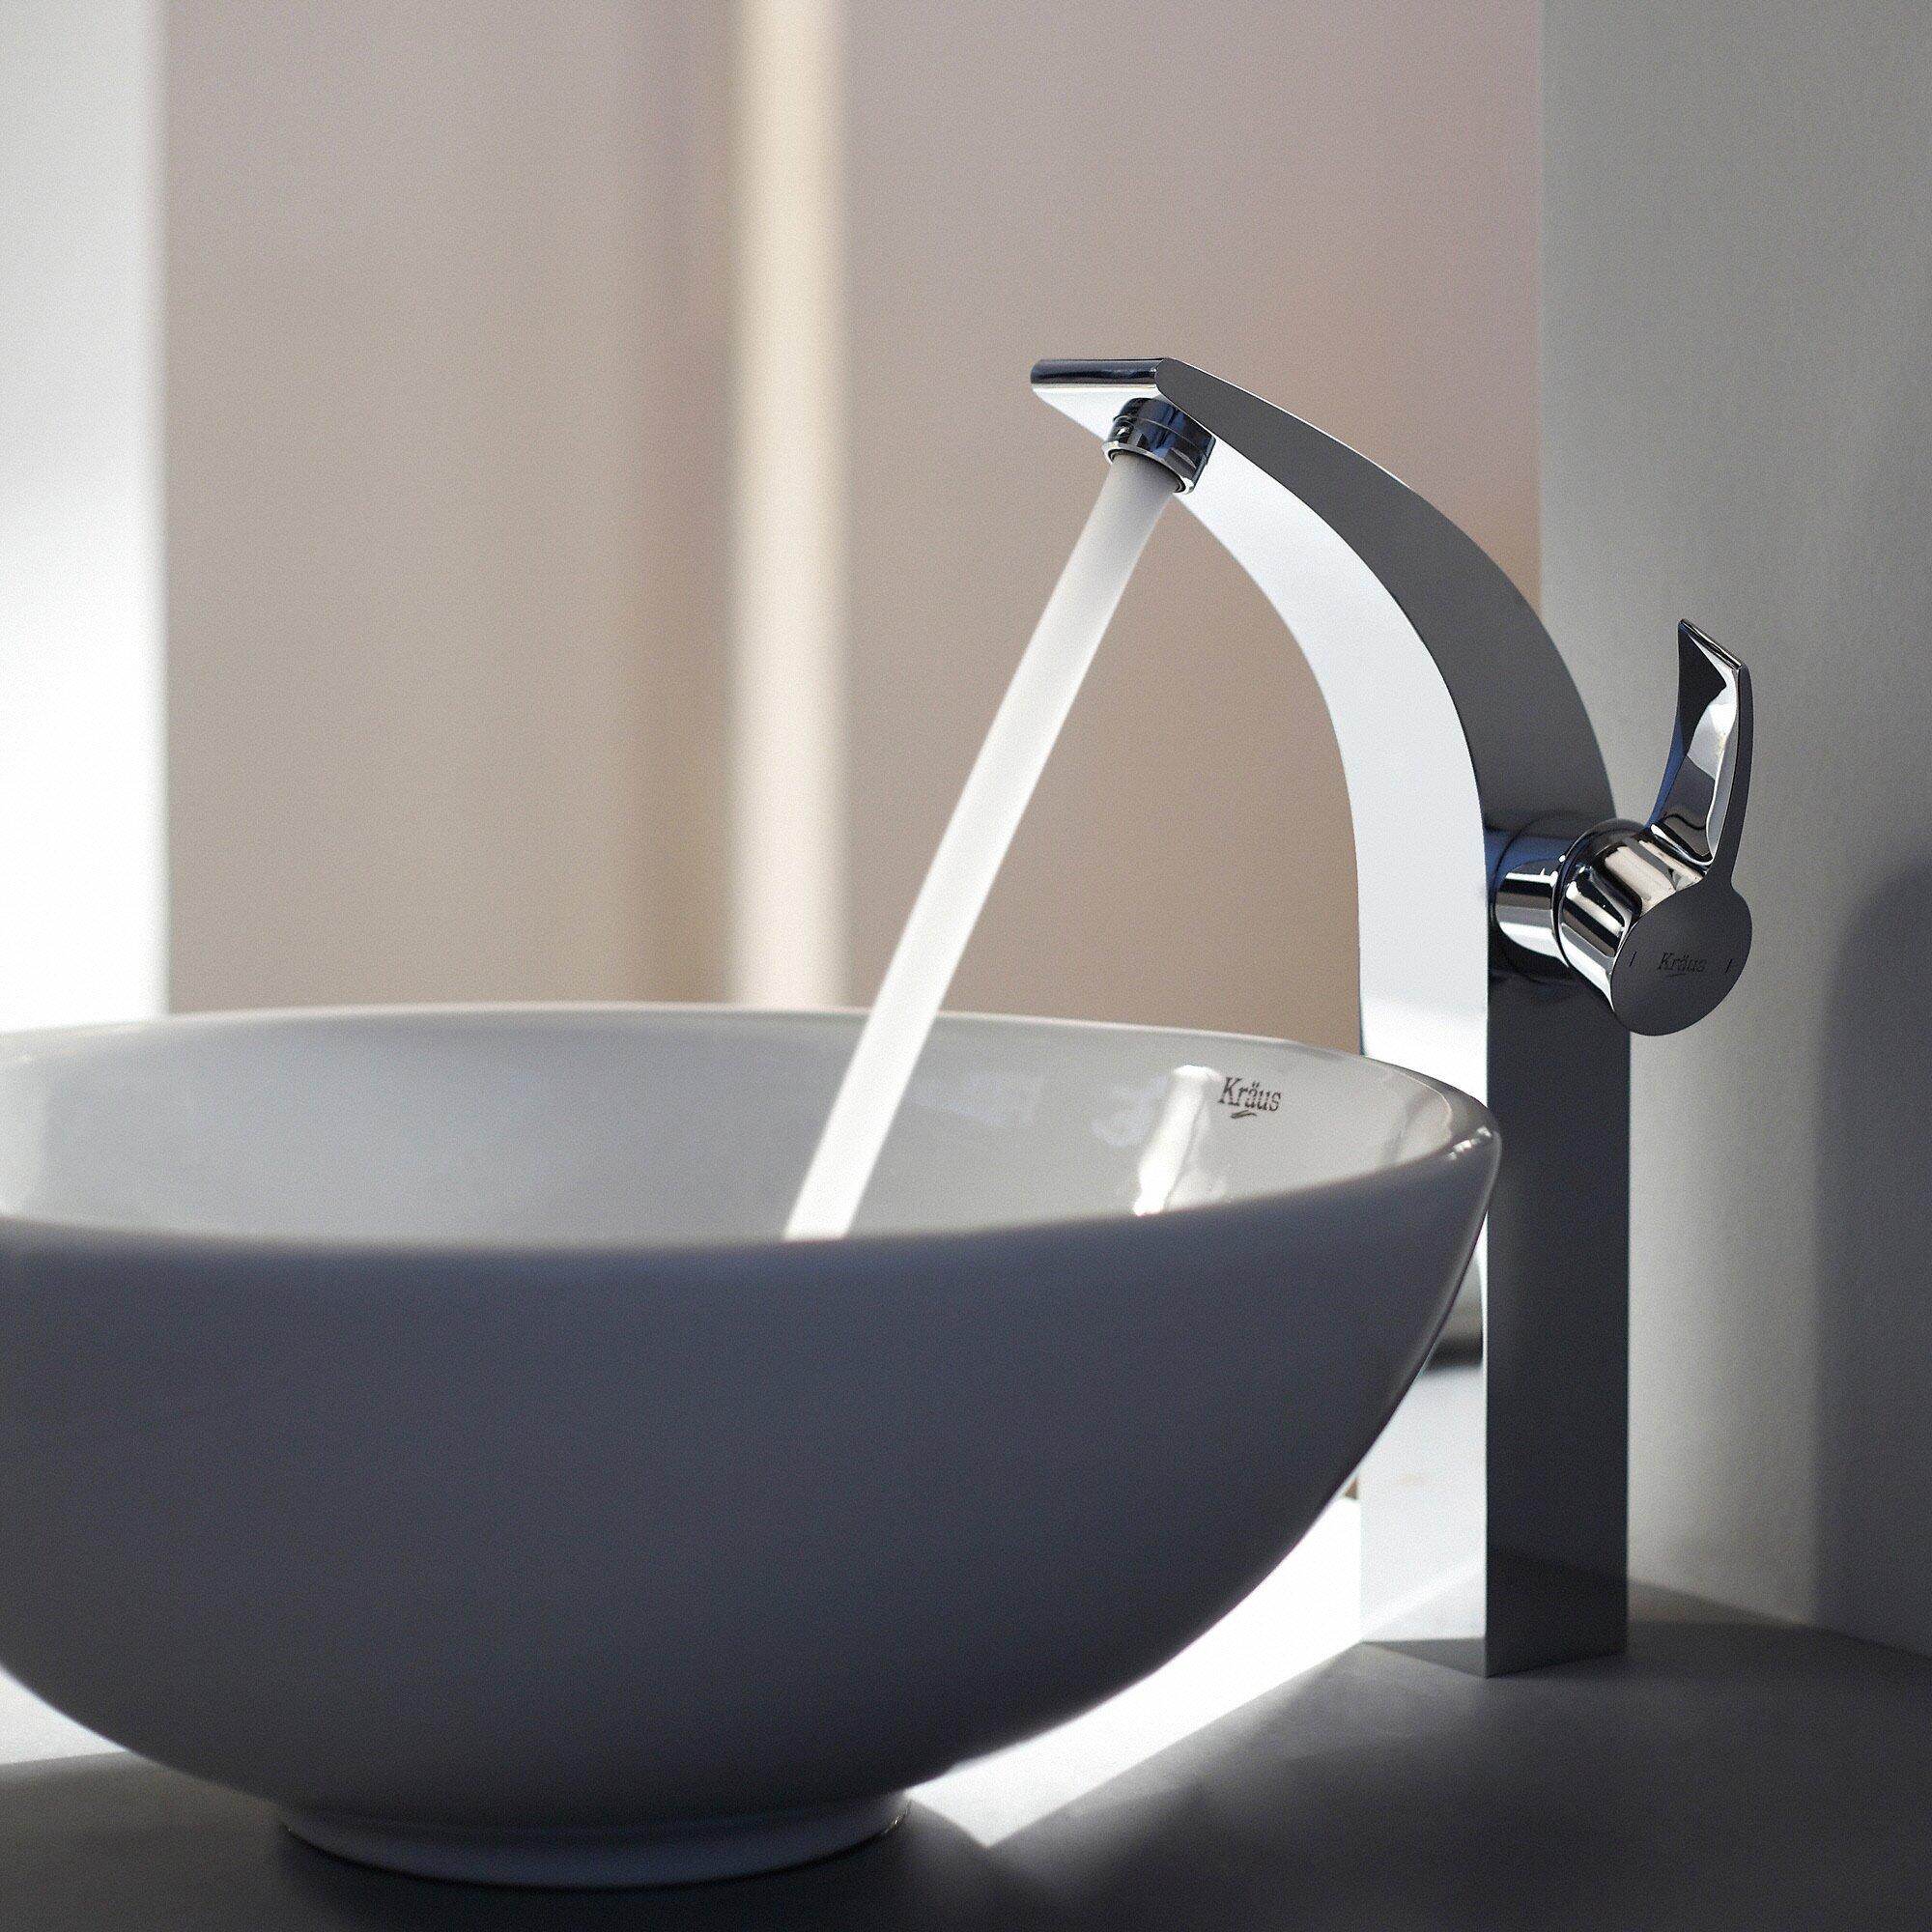 Bathroom Sink Round : Kraus Ceramic Round Vessel Bathroom Sink & Reviews Wayfair